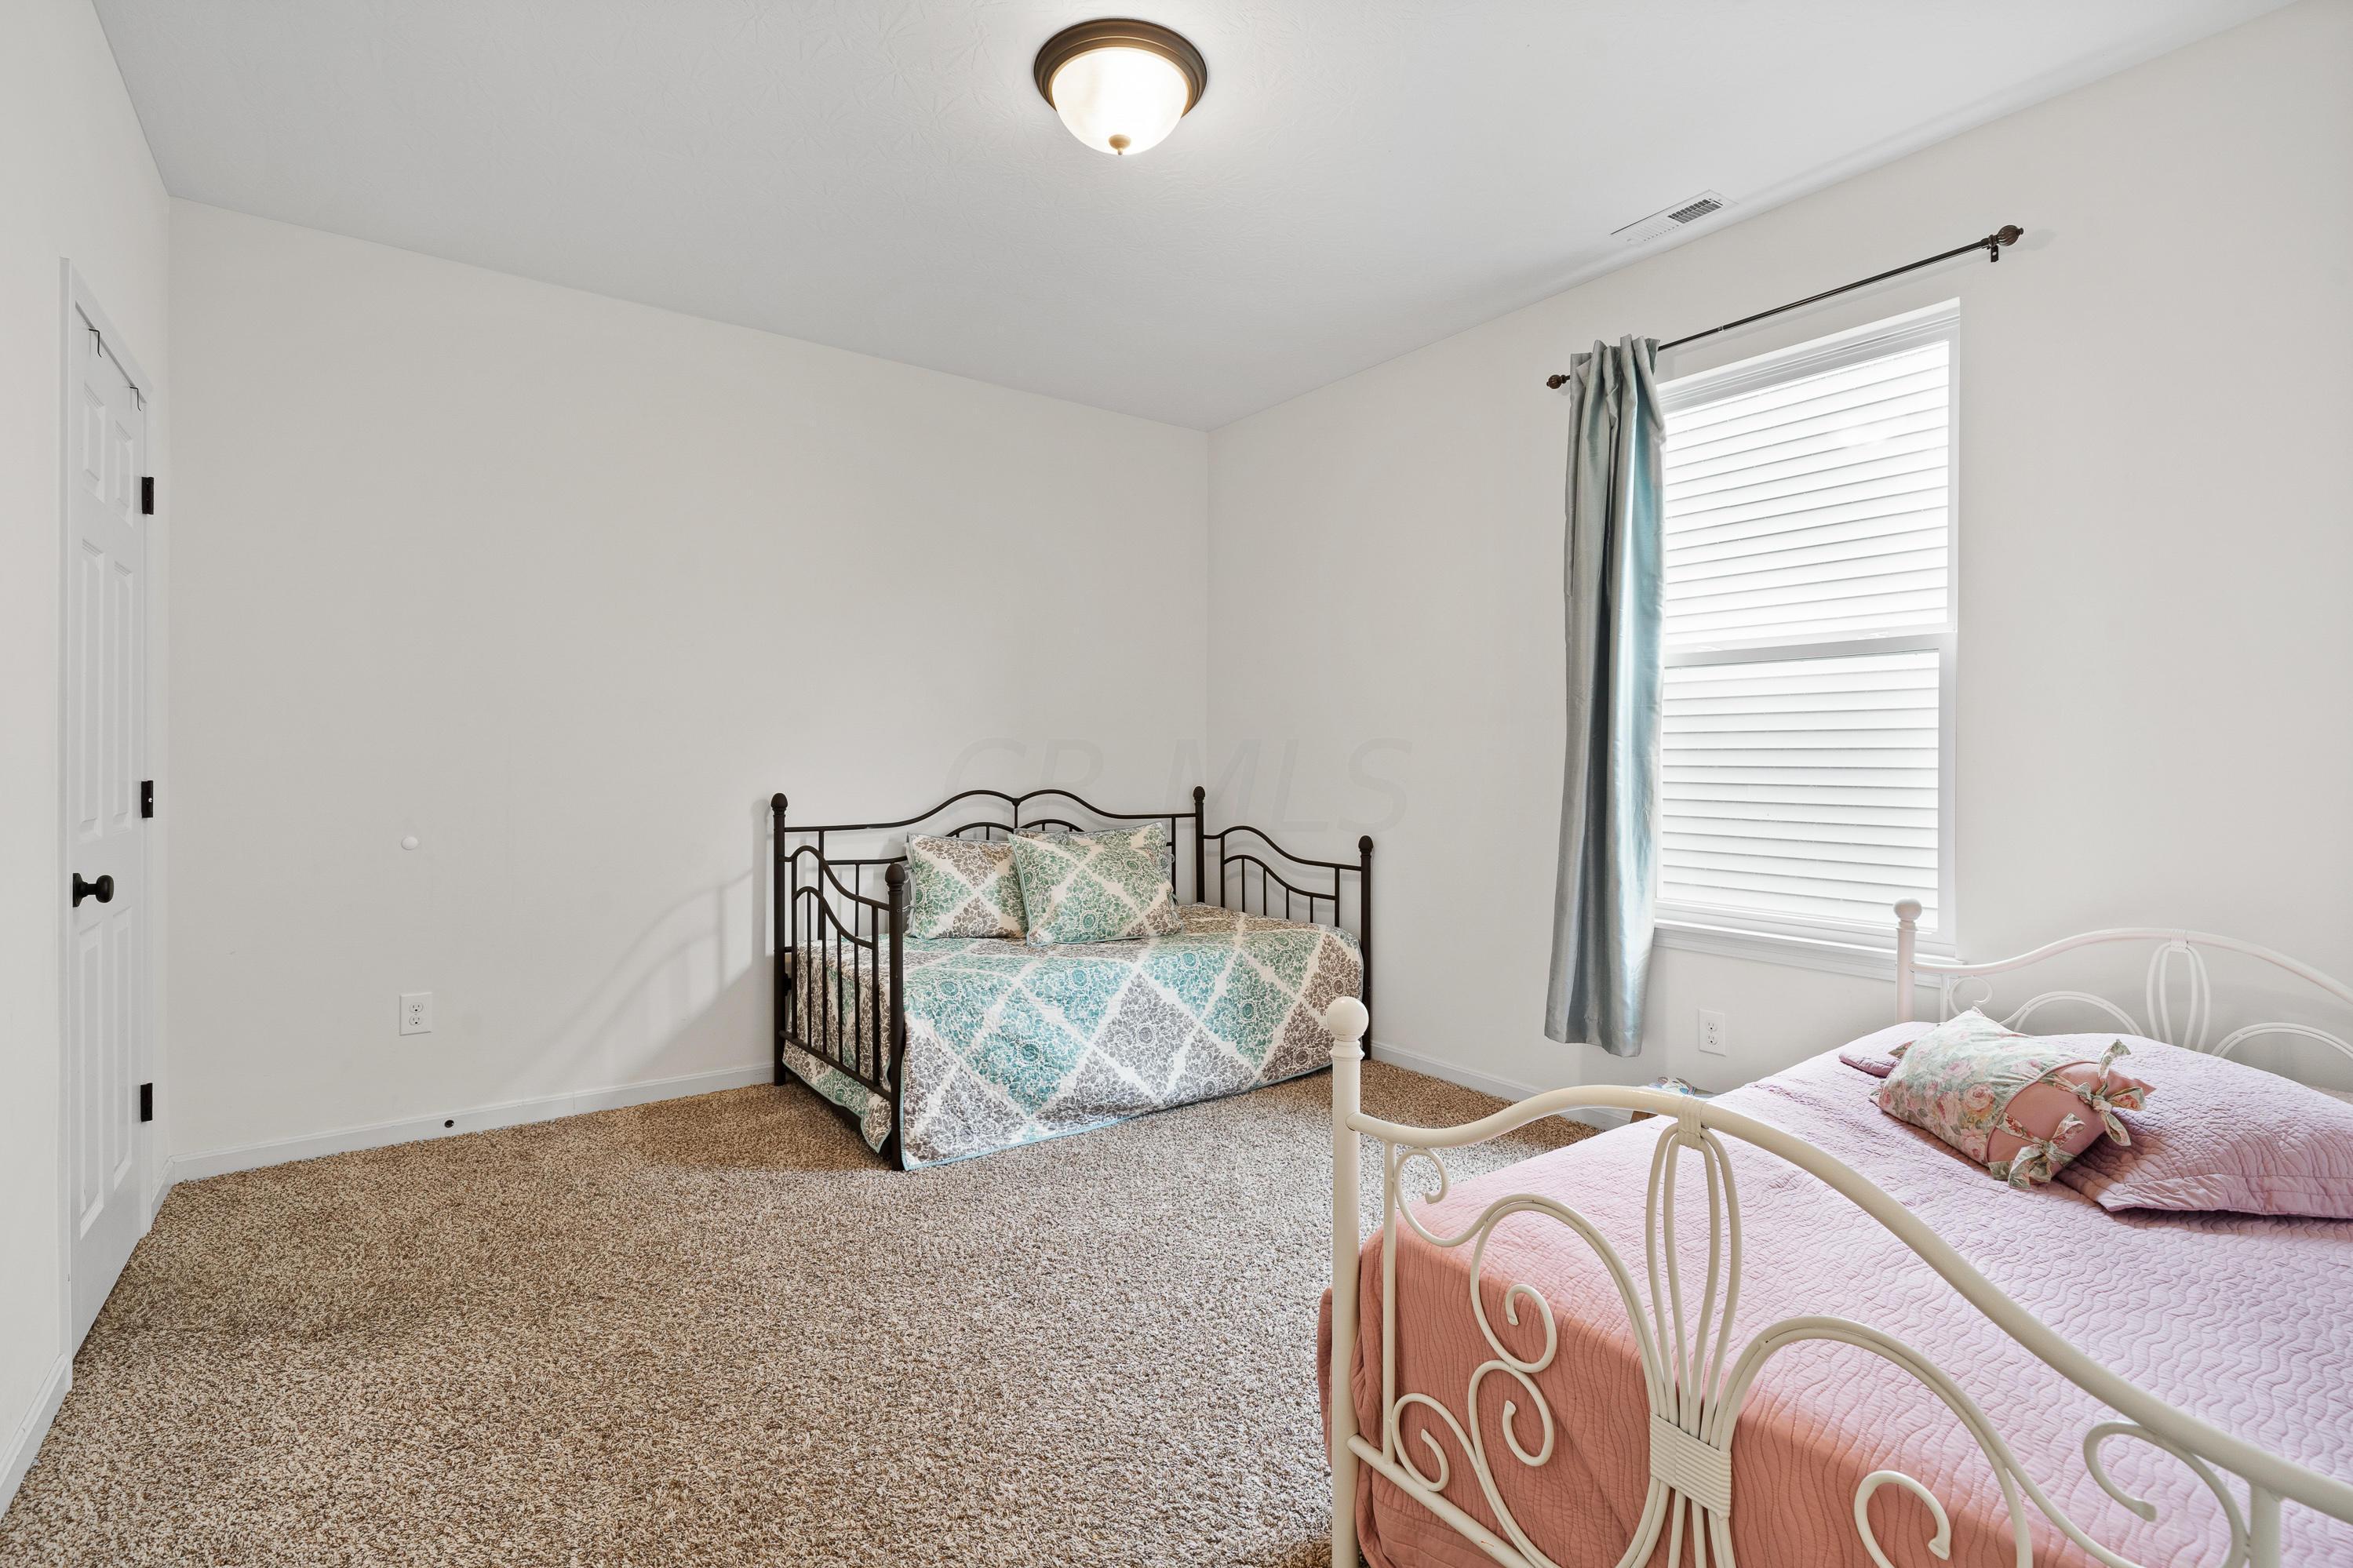 3732 Sanctuary Loop, Hilliard, Ohio 43026, 3 Bedrooms Bedrooms, ,2 BathroomsBathrooms,Residential,For Sale,Sanctuary,220031933